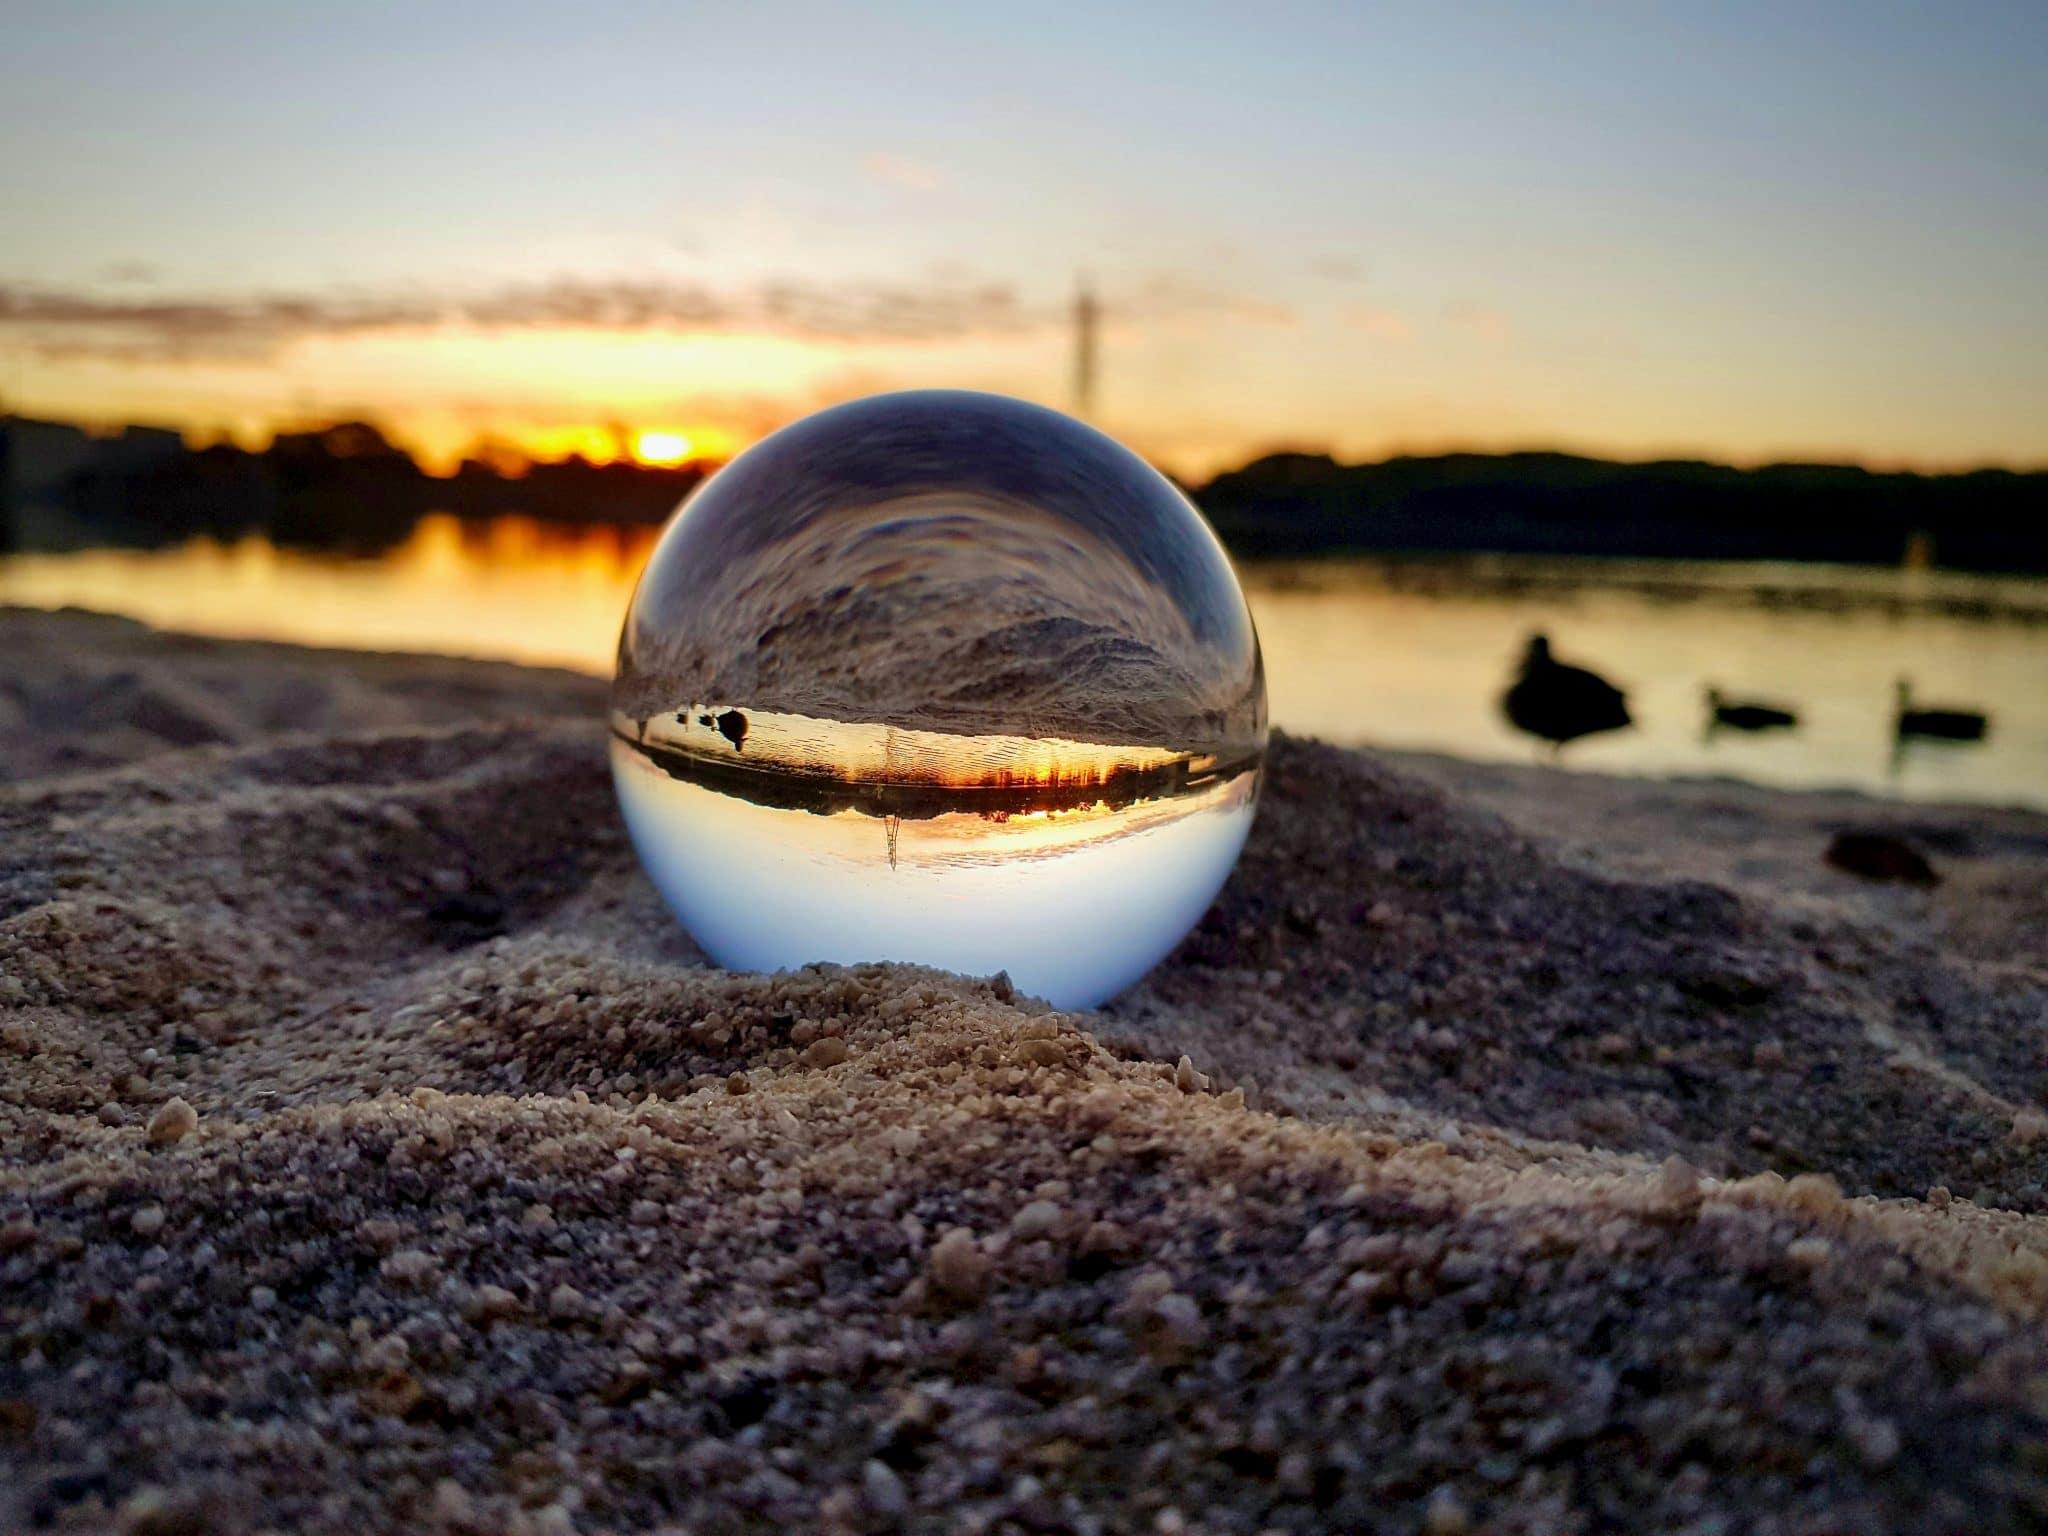 Glaskugel Fotografie Glaskugel im Sand vor see und sonnenuntergang